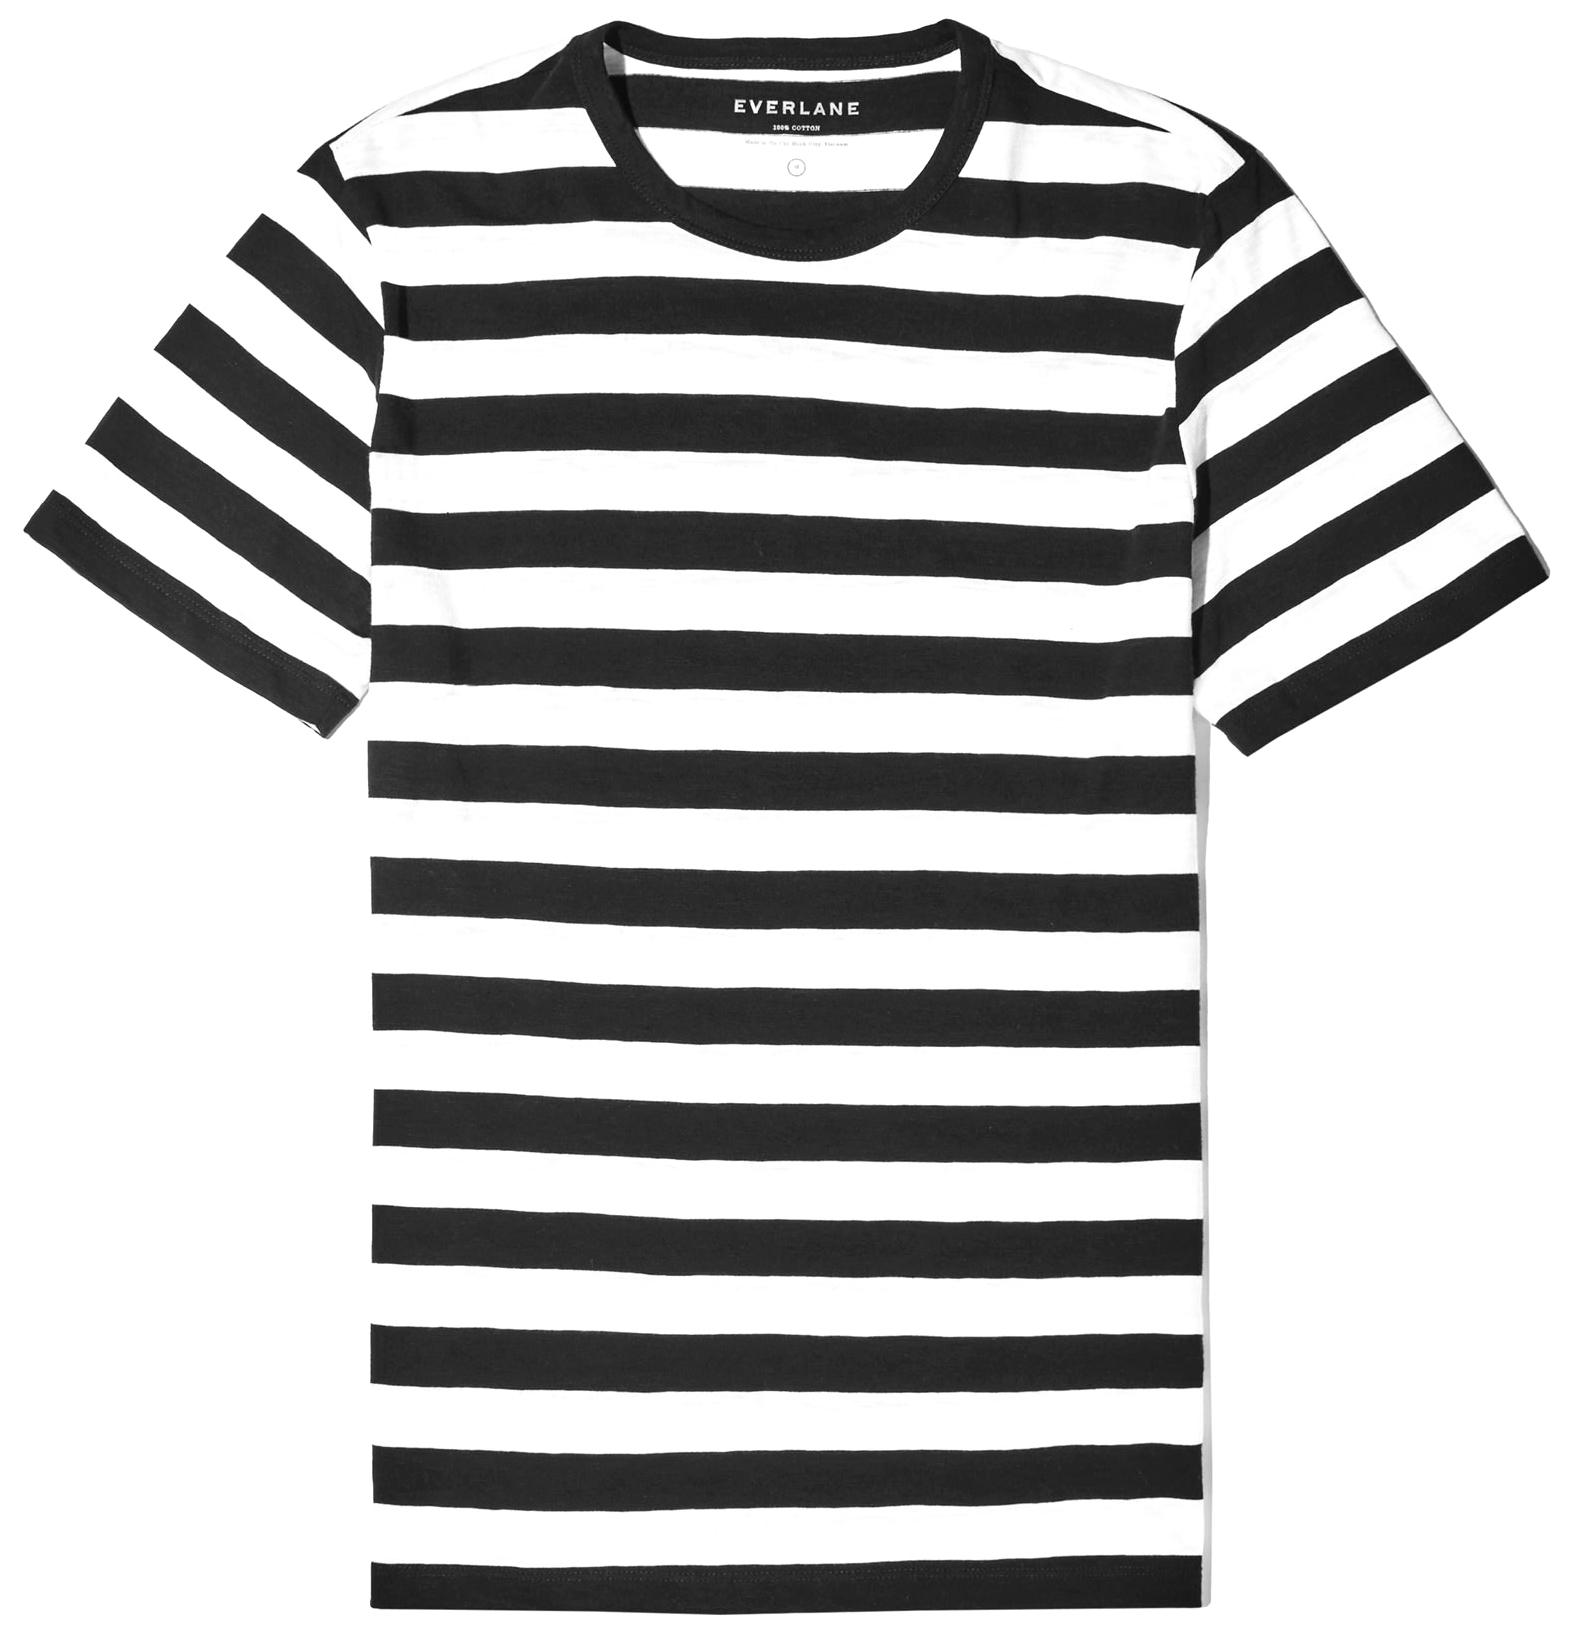 Everlane Rugby Stripe Shirt